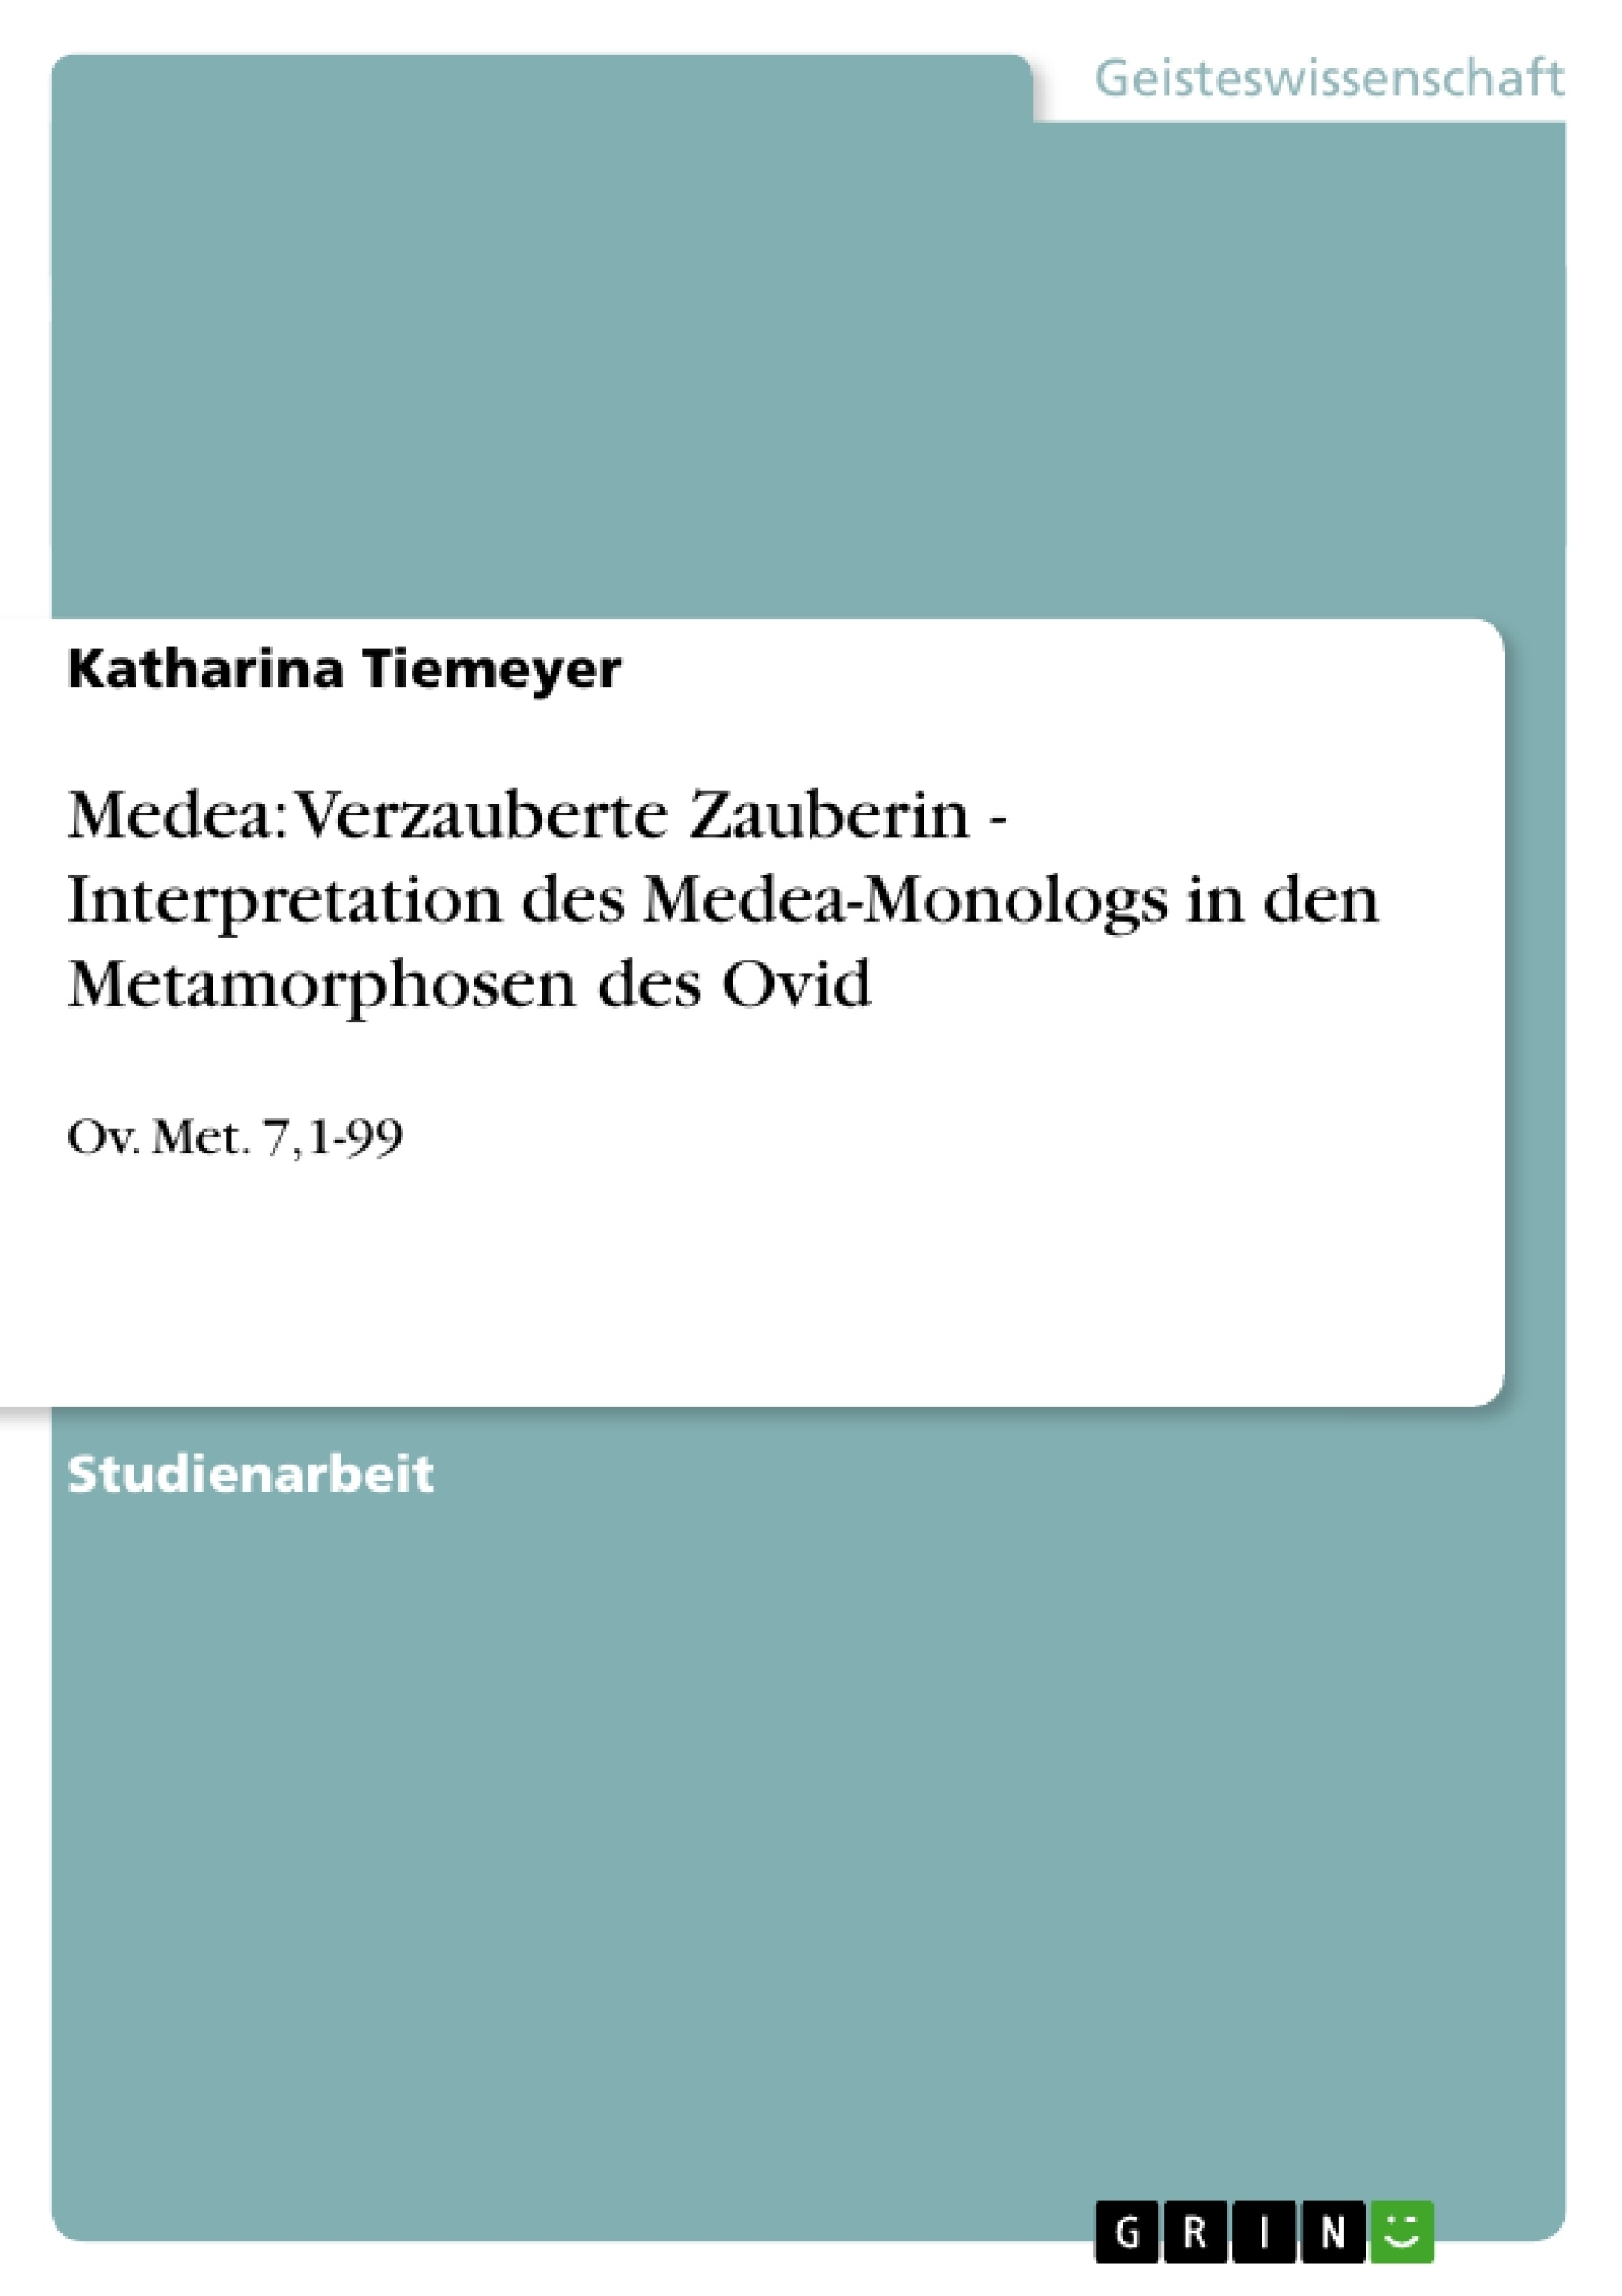 Titel: Medea: Verzauberte Zauberin - Interpretation des Medea-Monologs in den Metamorphosen des Ovid